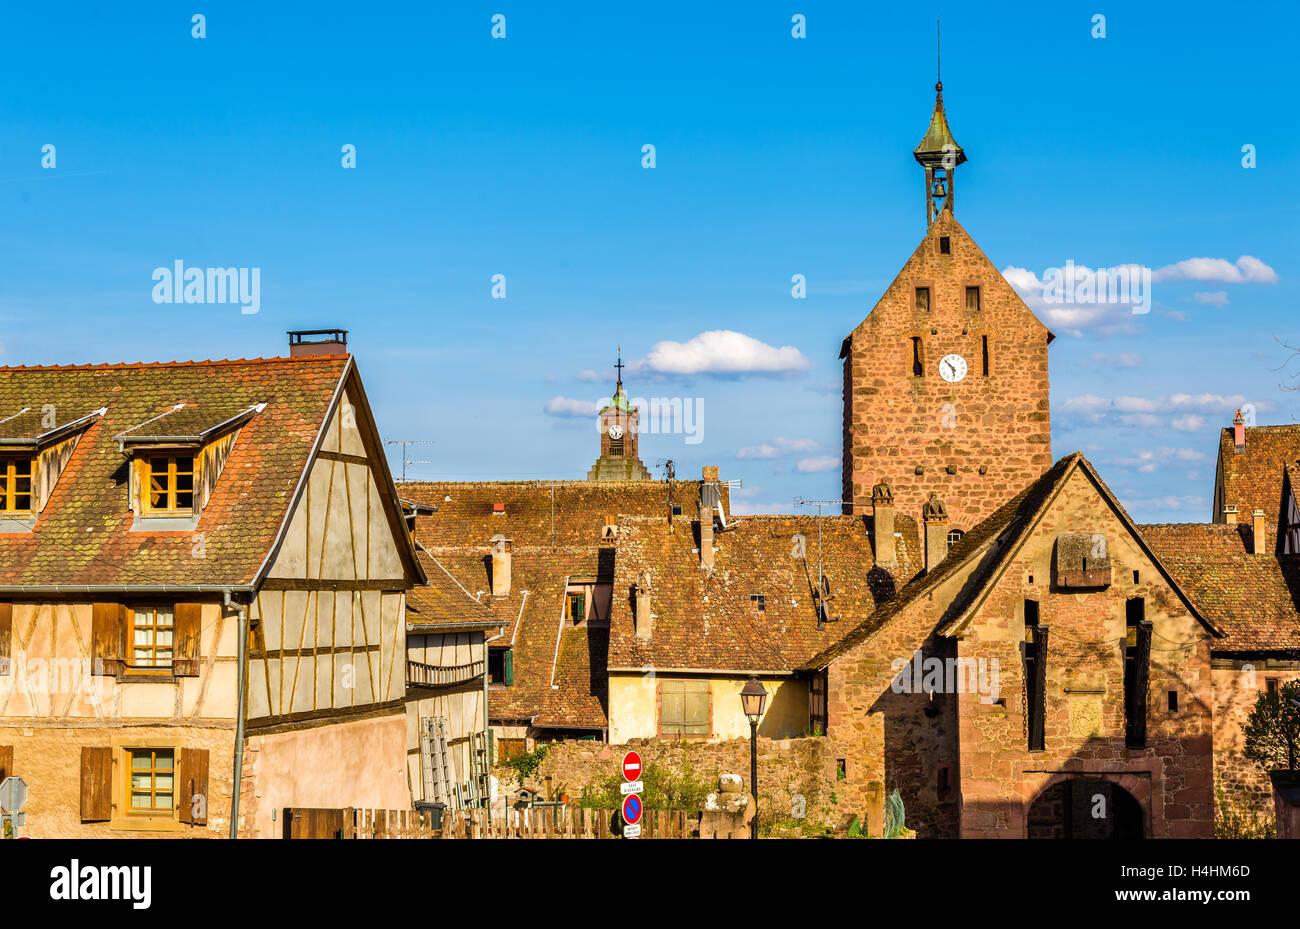 Porte Haute, a gate in Riquewihr - Alsace, France Stock Photo